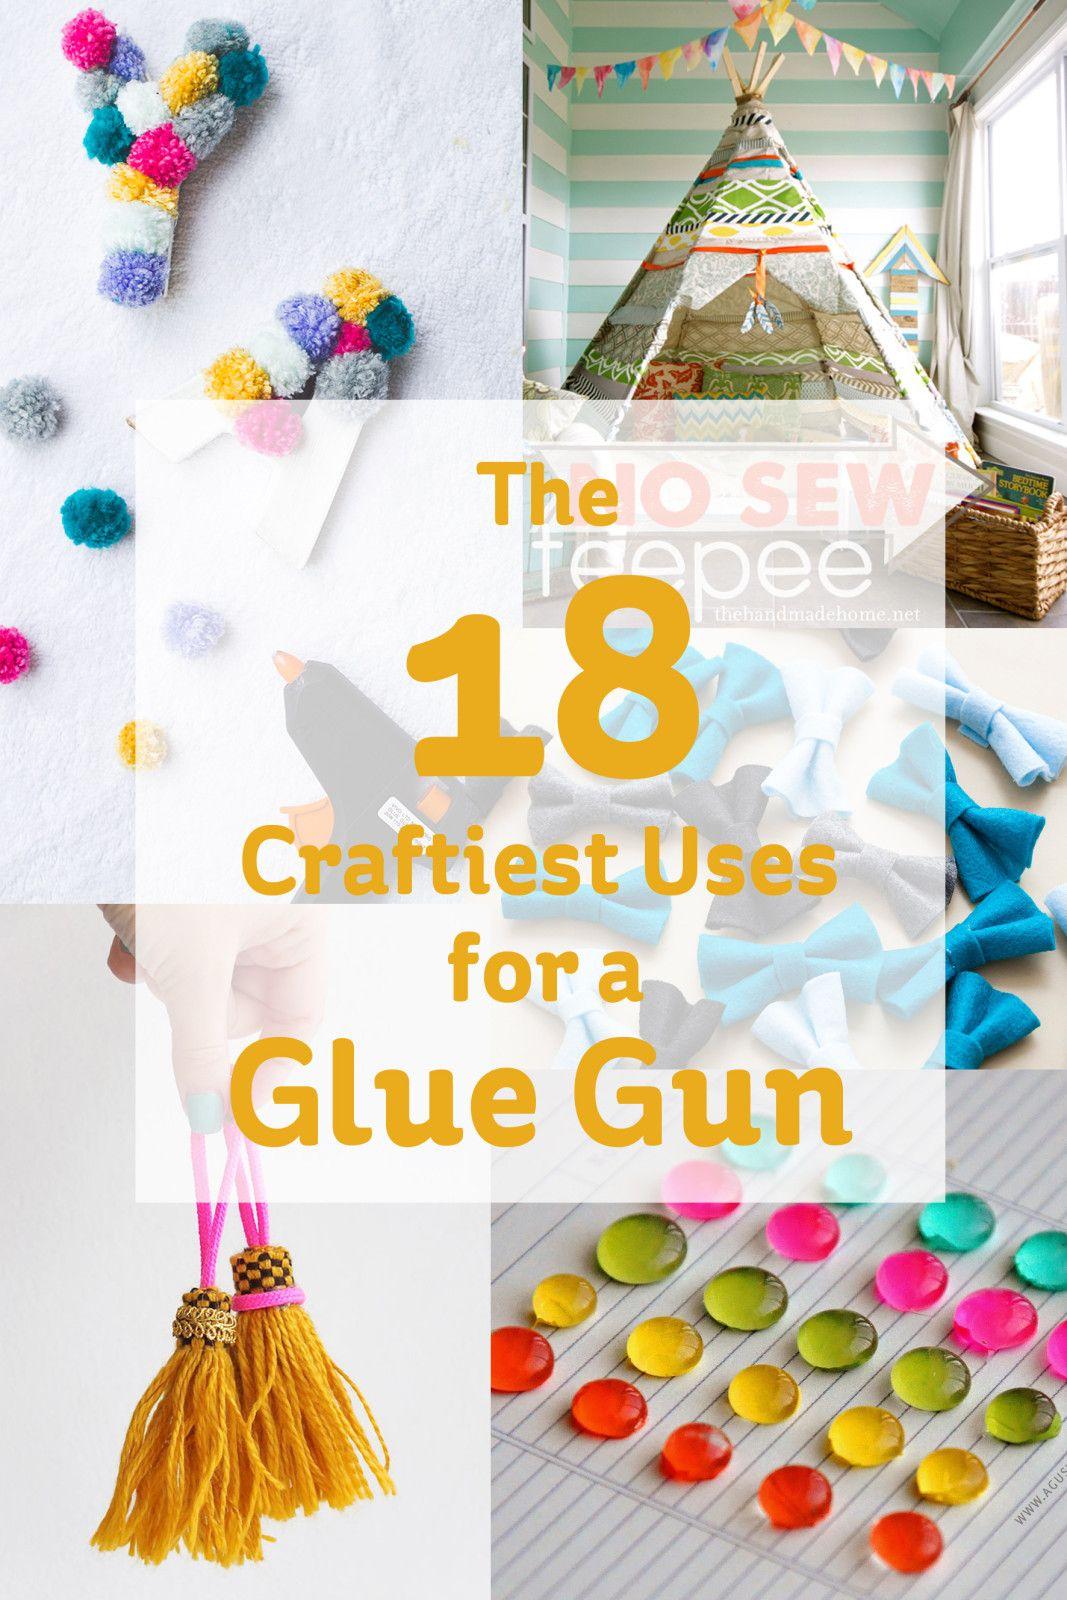 13++ Glue gun crafts with cardboard ideas in 2021